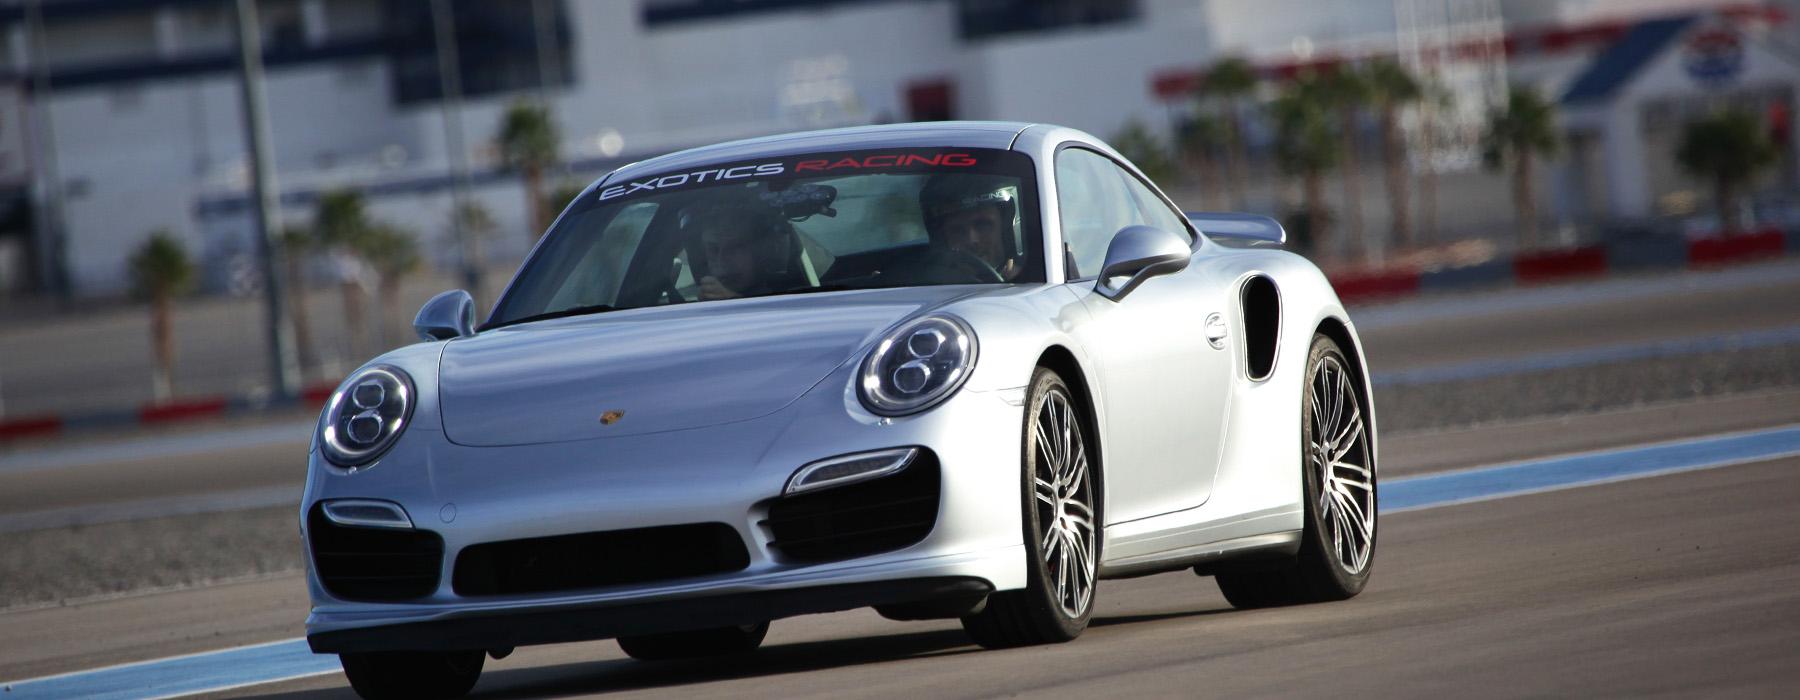 Drive a Porsche 991 Turbo